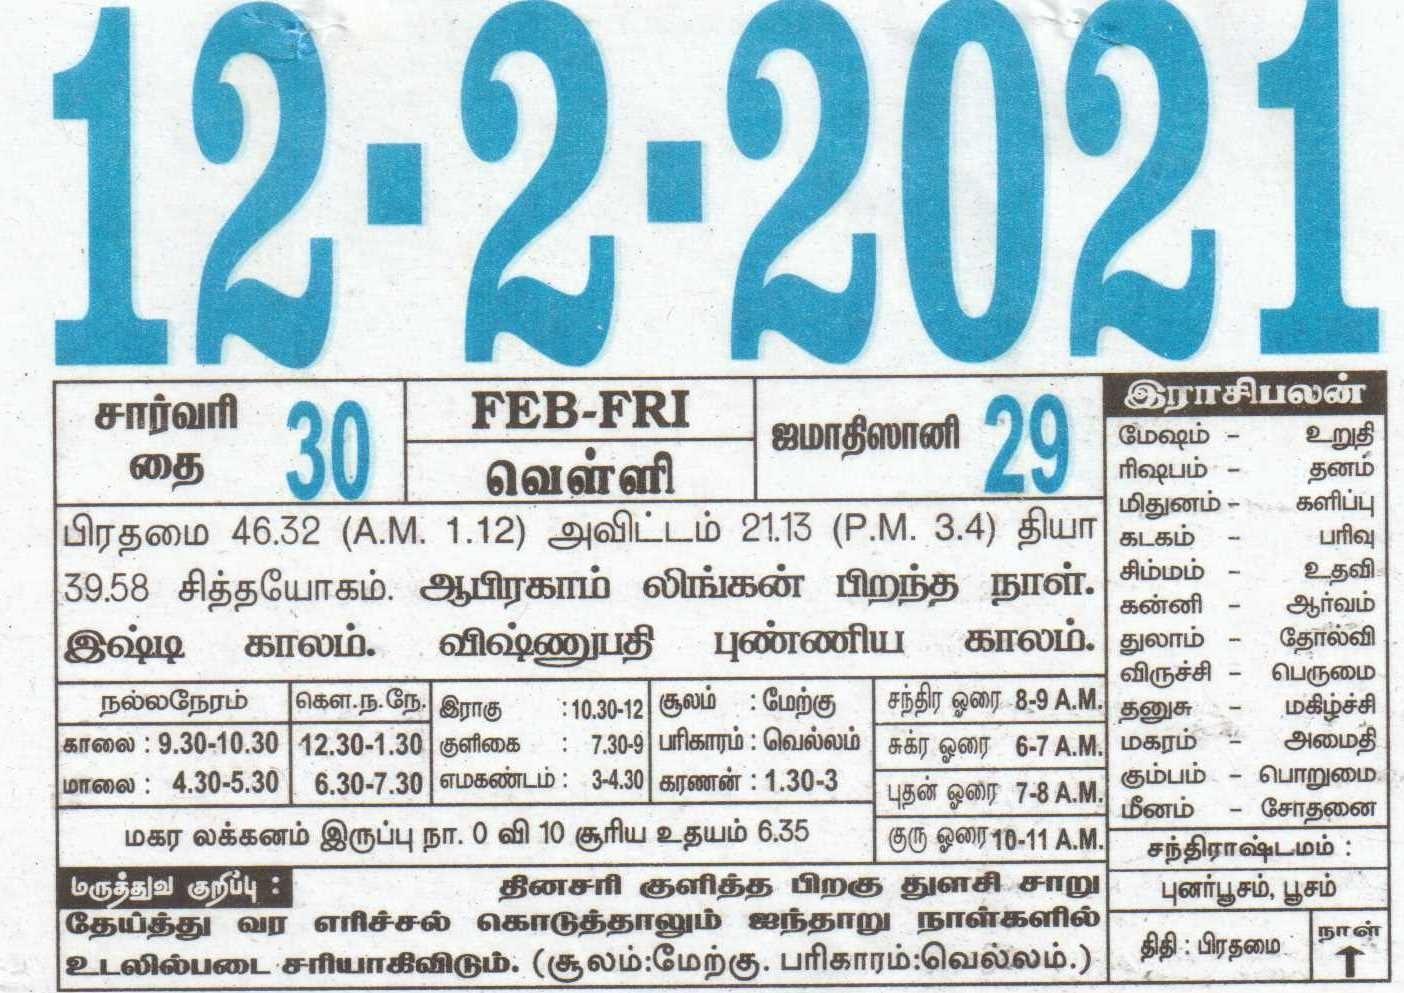 12-02-2021 Daily Calendar | Date 12 , January Daily Tear Off Calendar | Daily Panchangam Rasi Palan Marriage Dates In June 2021 Hindu Calendar